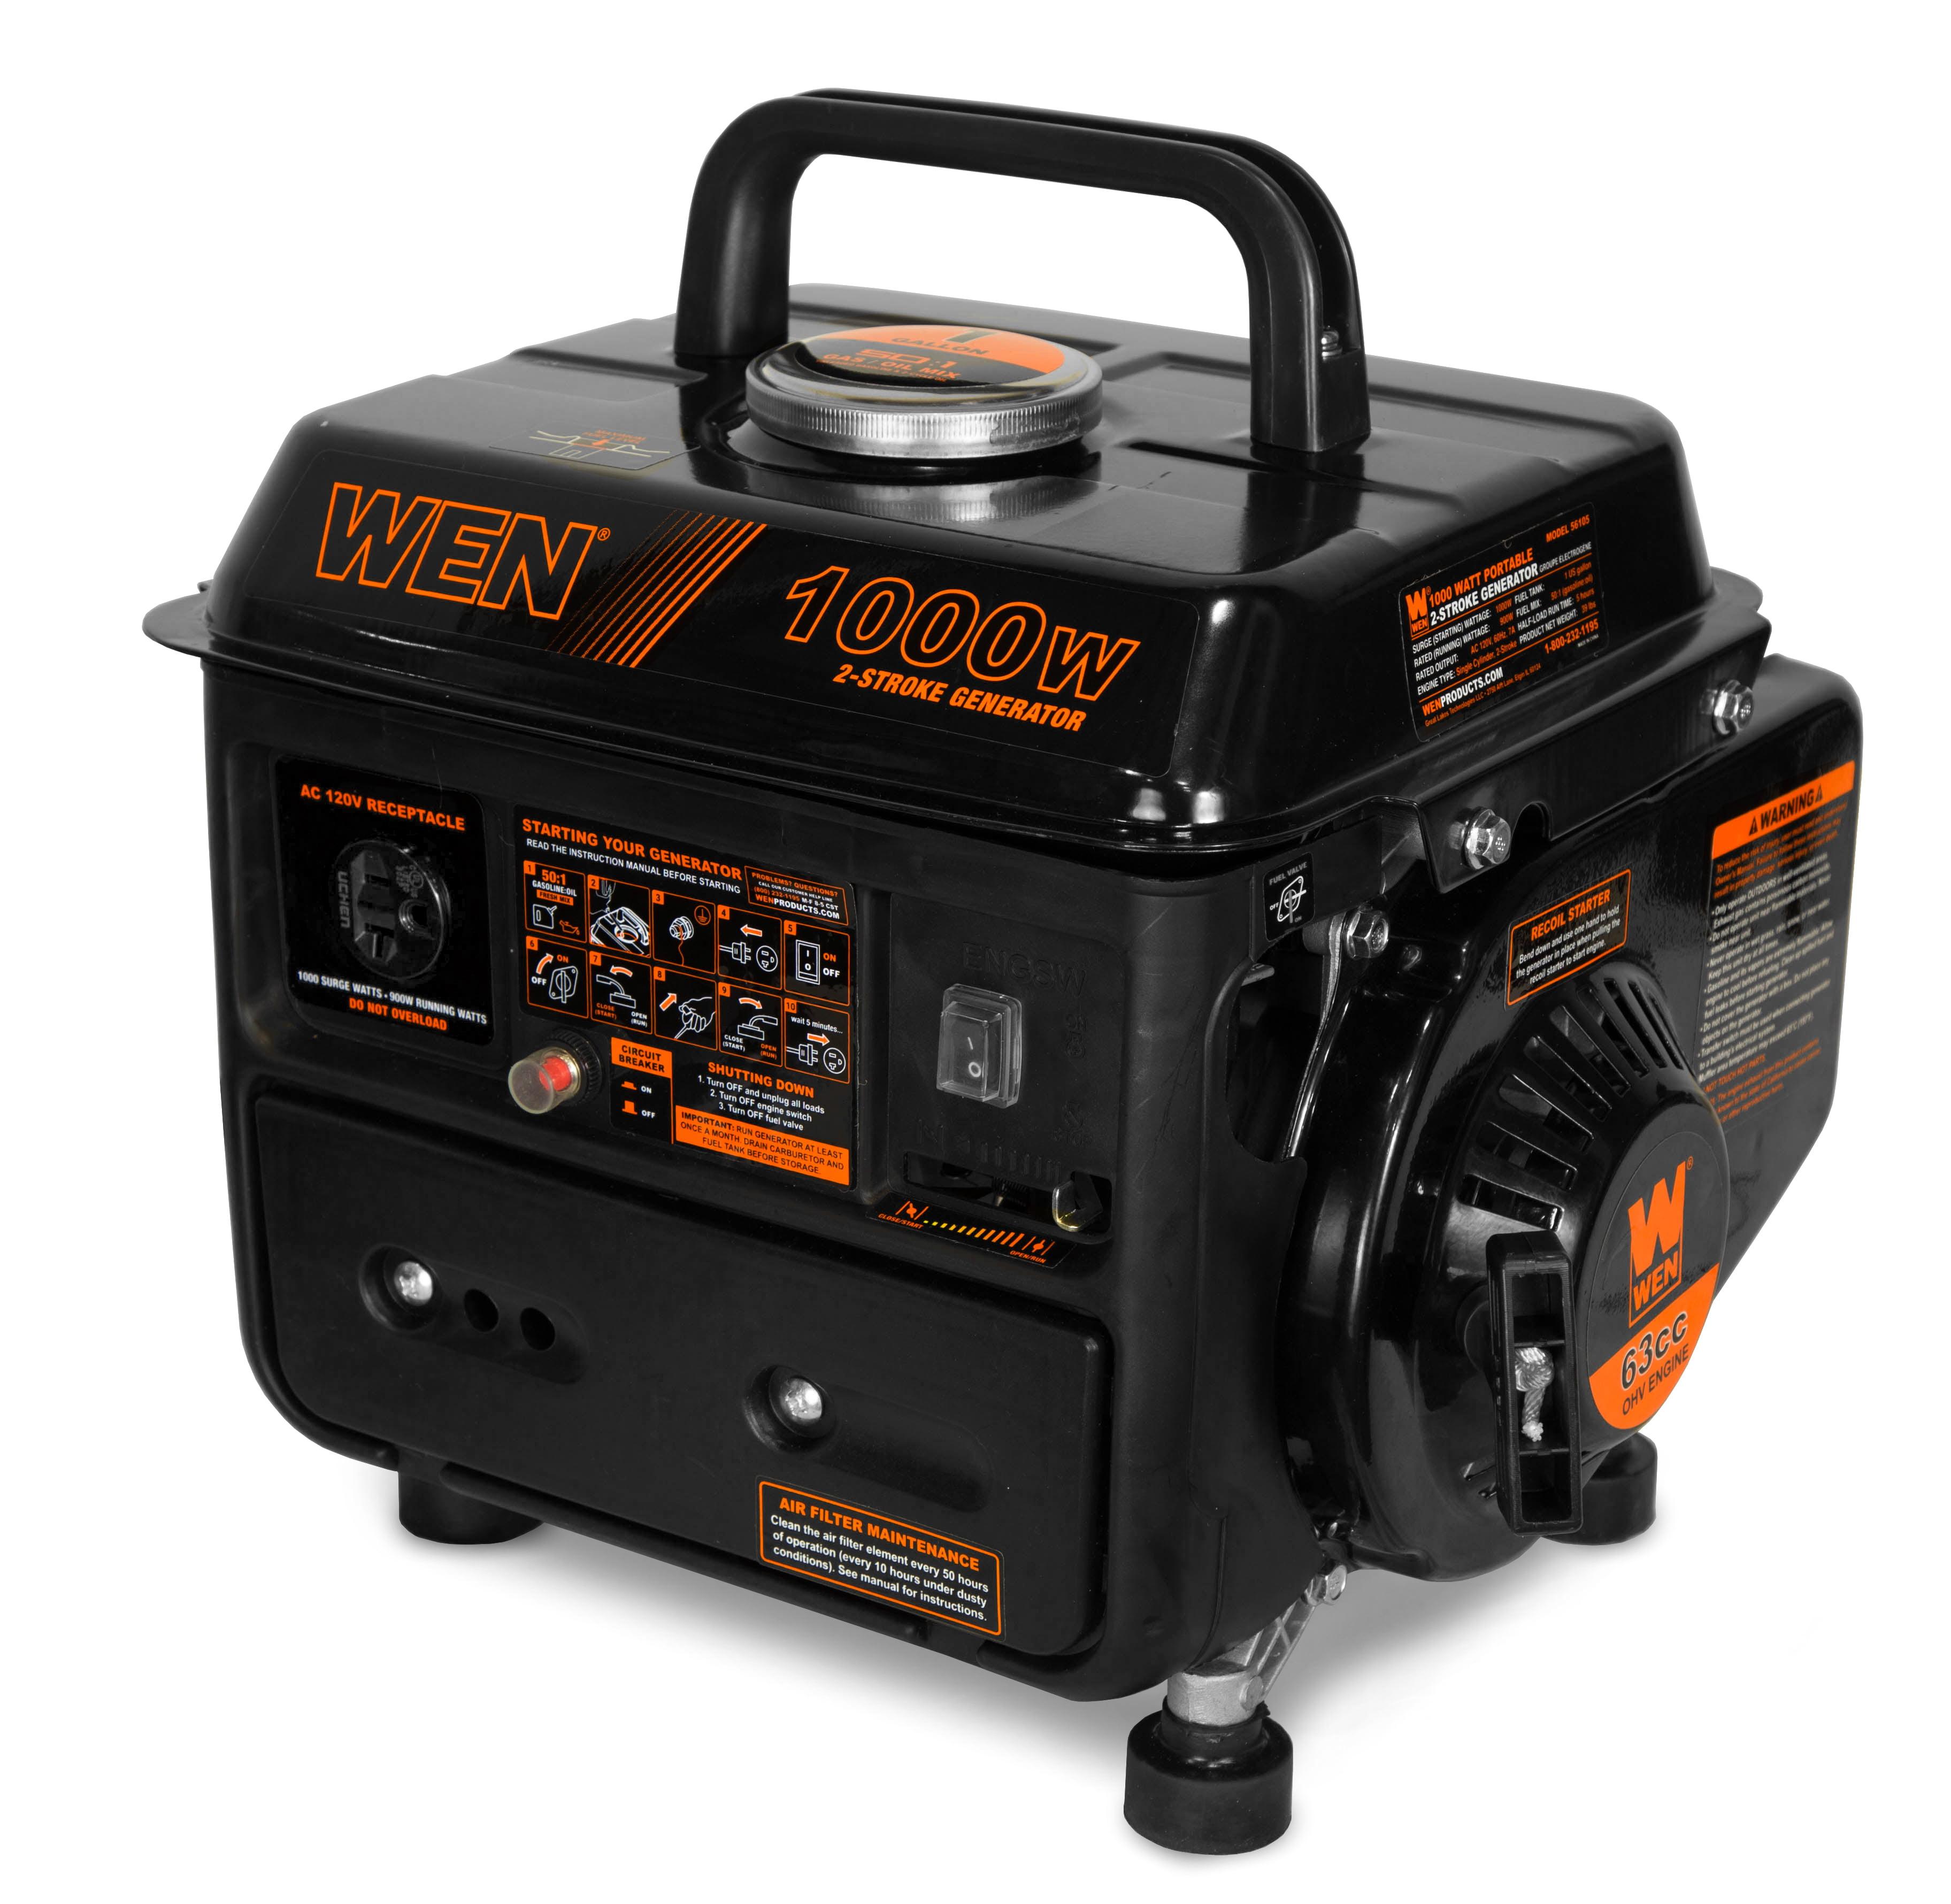 WEN 1000-Watt Portable Generator, CARB Compliant